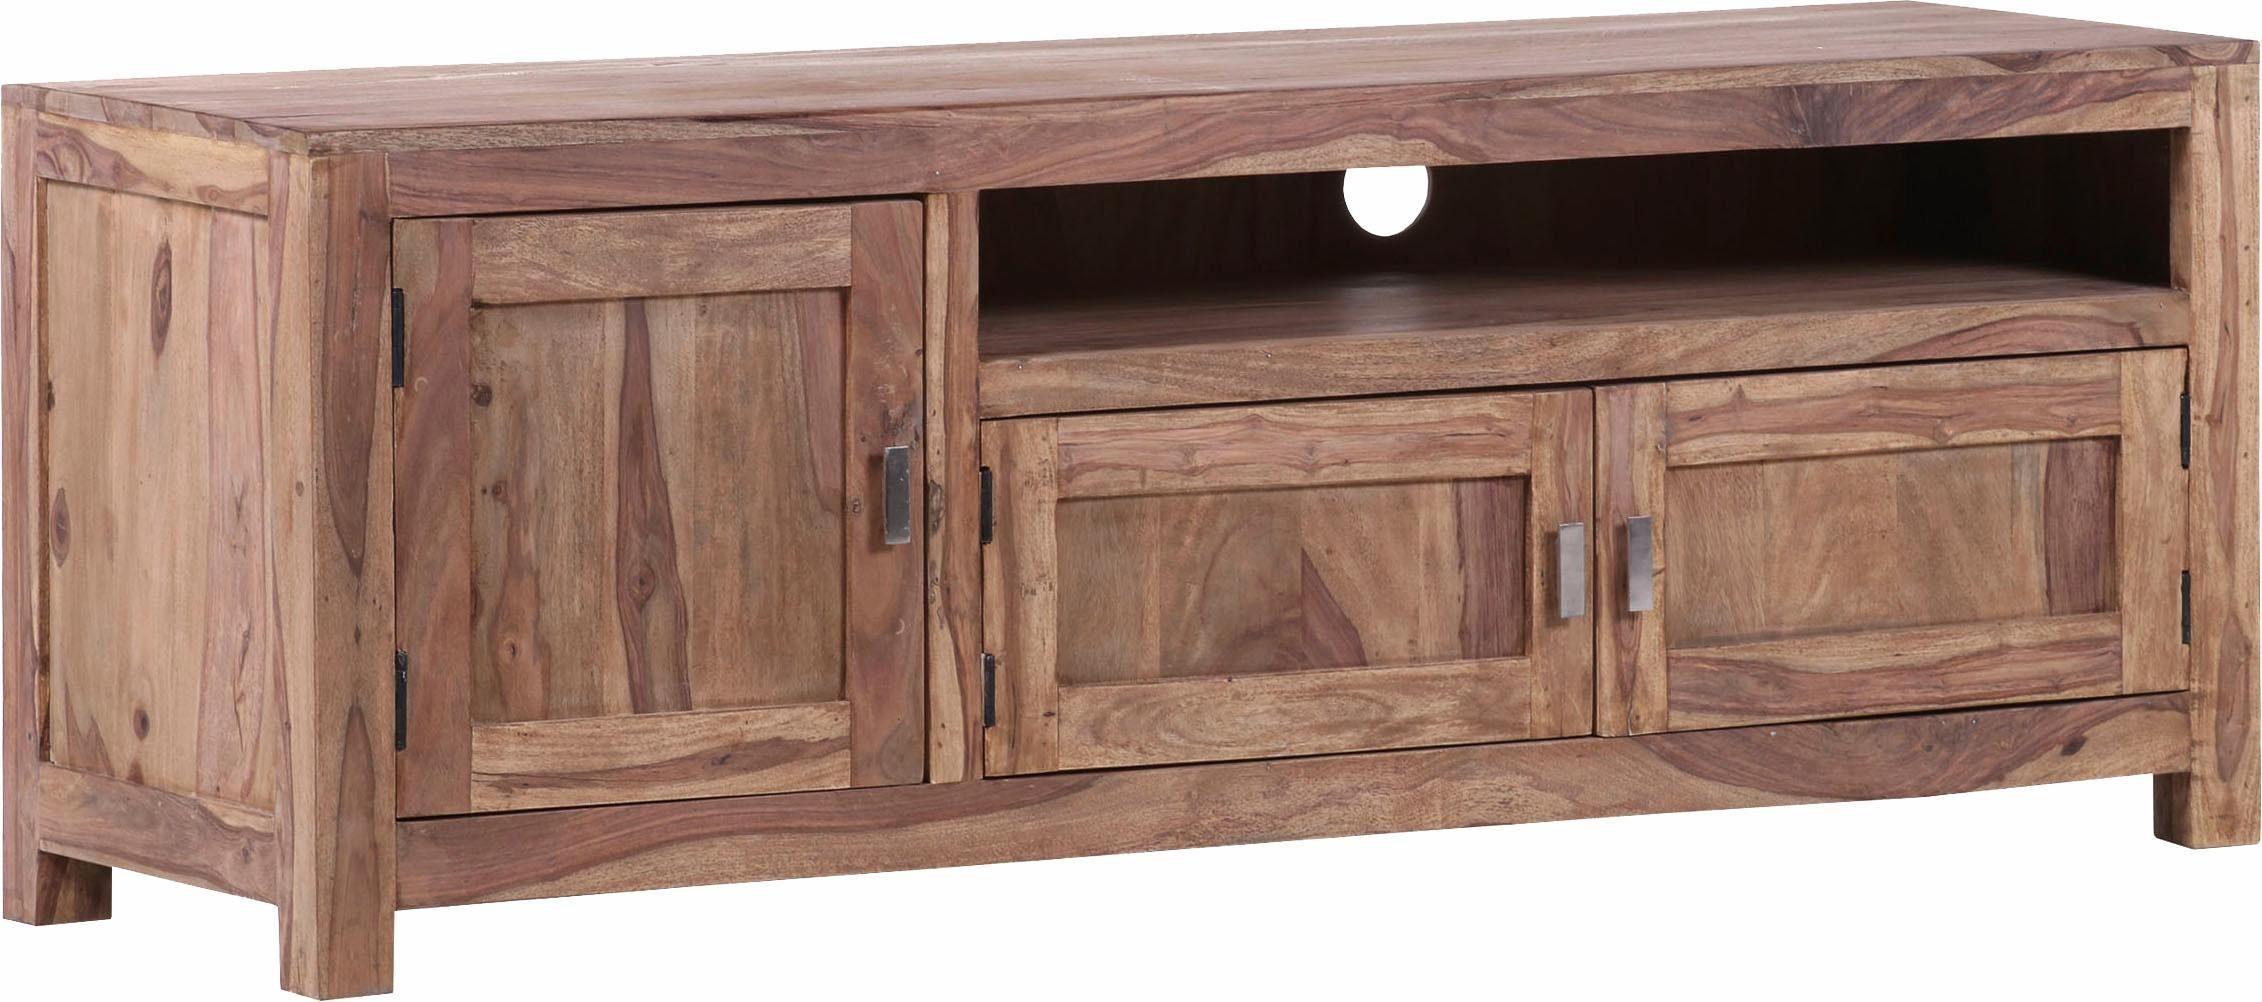 Gutmann Factory TV-Lowboard »Inka« aus massivem Sheesham Holz, Breite 160 cm